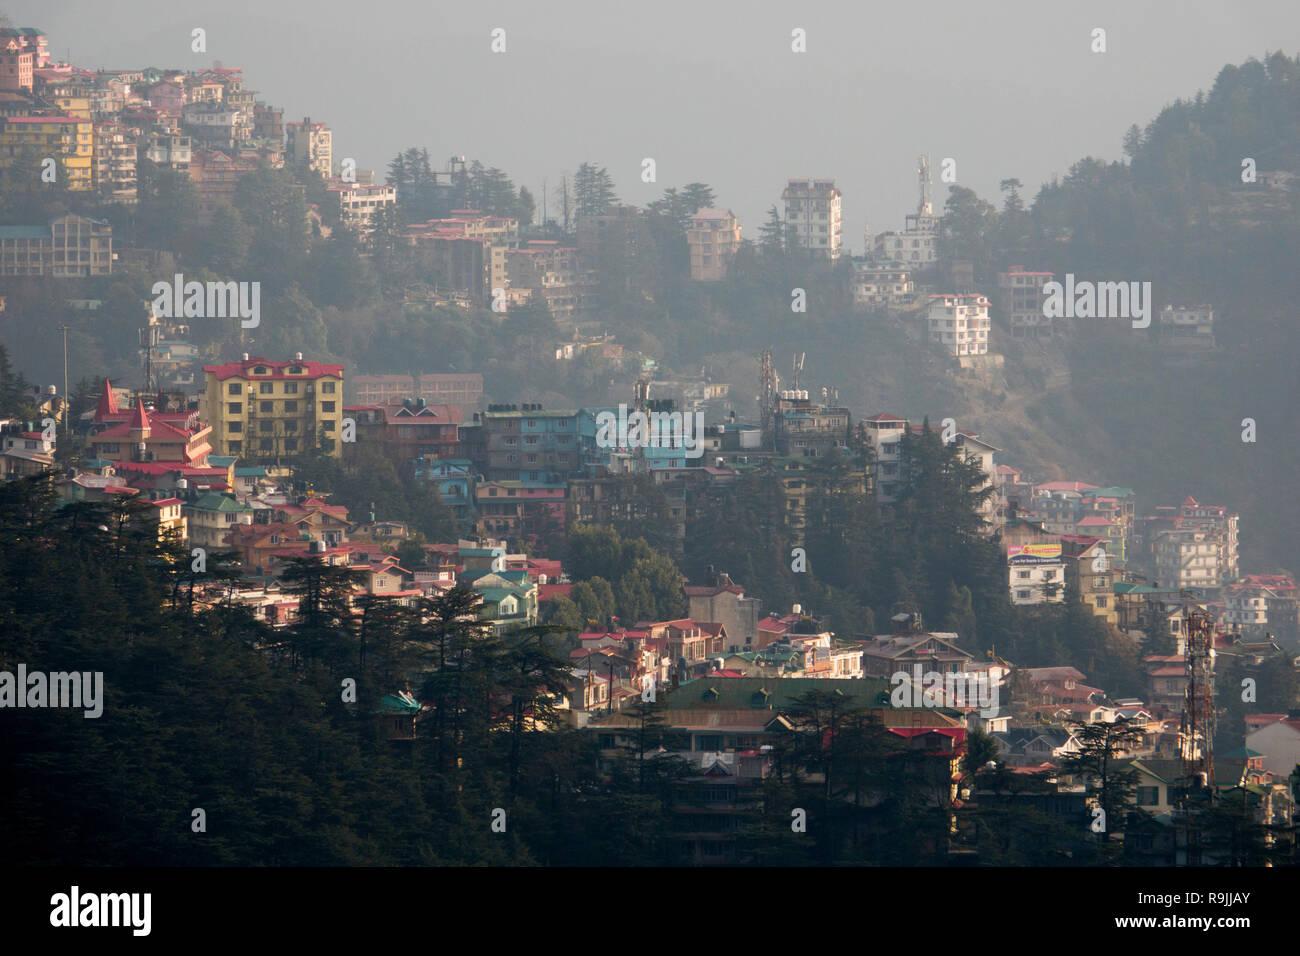 View of Shimla in Himachal Pradesh, India - Stock Image